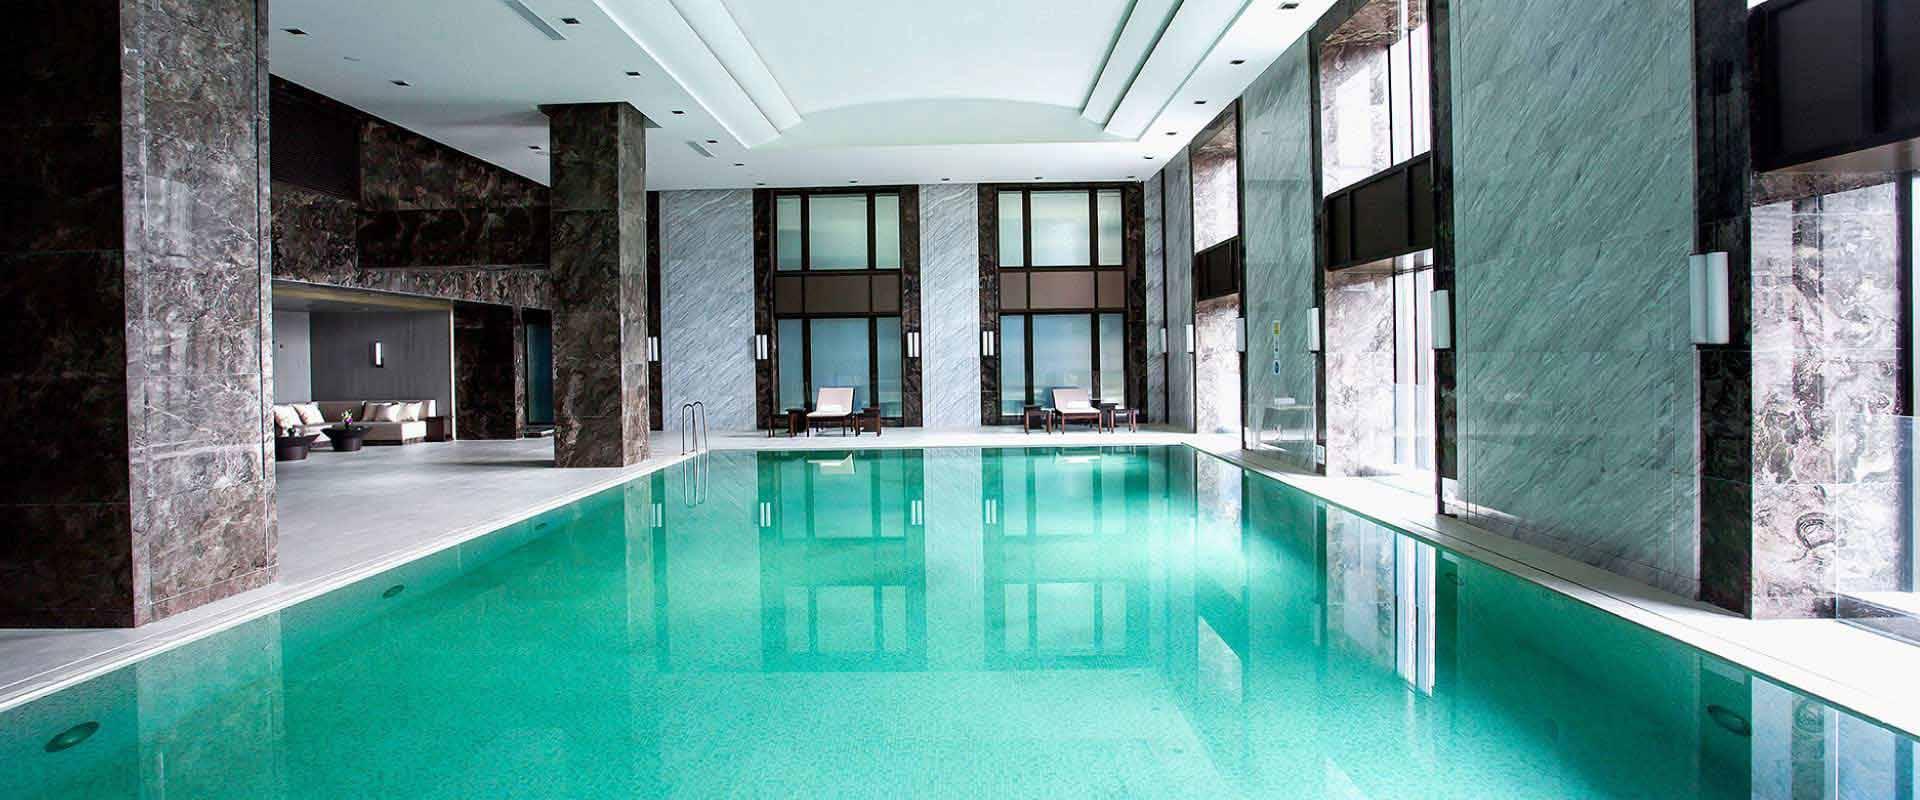 Swimming Pool Facilities Marco Polo Changzhou